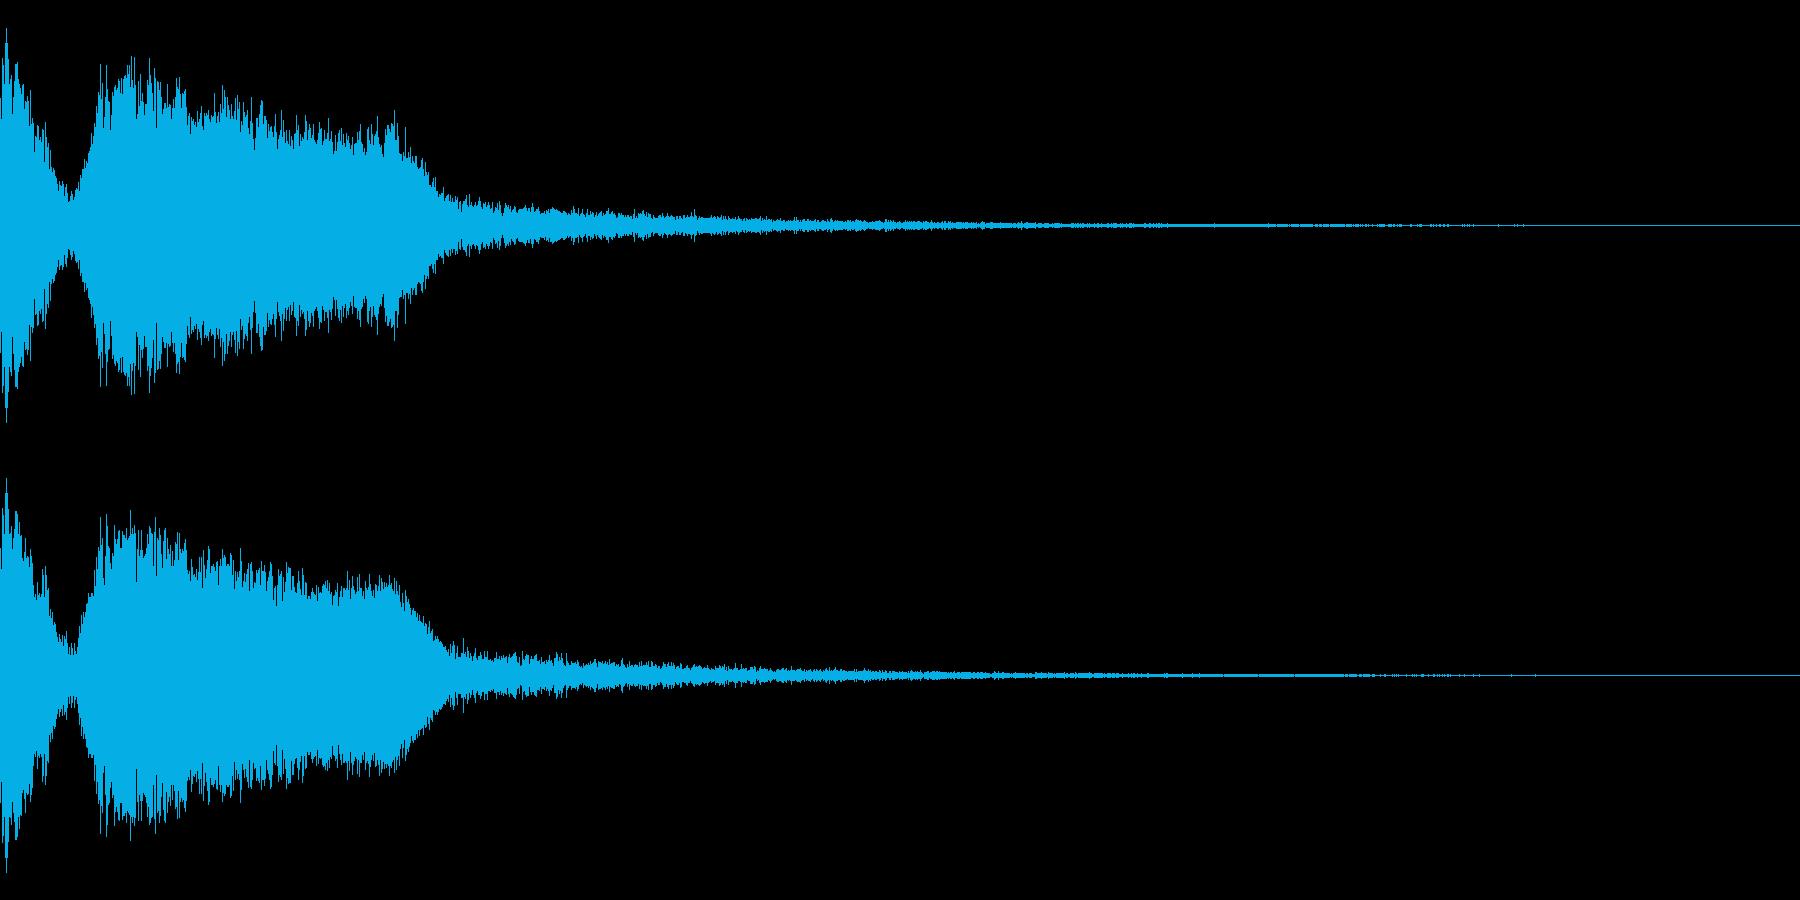 DJFX ヒットチャート発表前SE 2の再生済みの波形